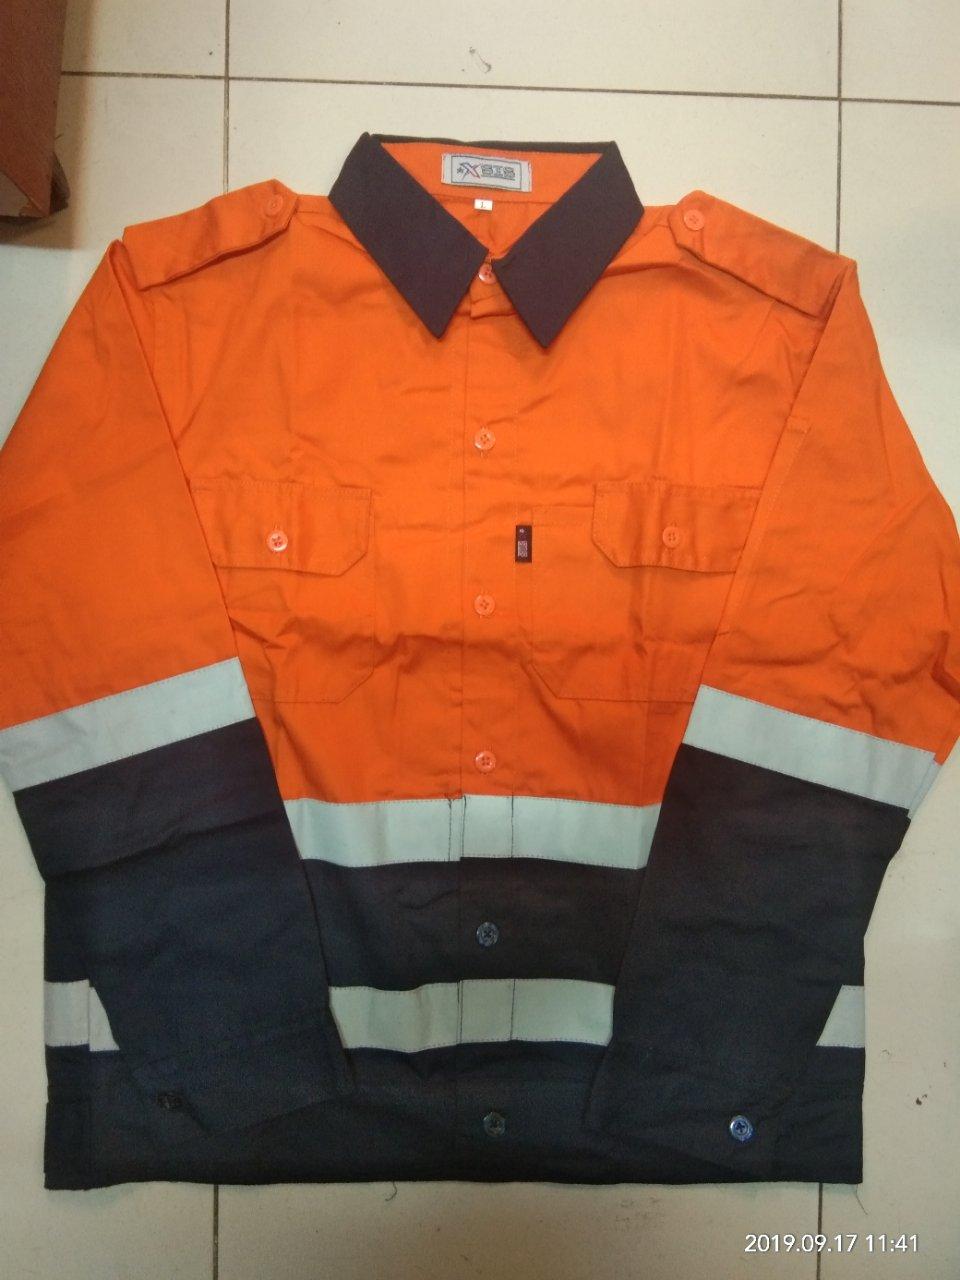 Jual baju safety, distributor baju safety, Jual baju proyek, jual baju proyekJual baju safety, distributor baju safety, Jual baju proyek, jual baju proyekJual baju safety, distributor baju safety, Jual baju proyek, jual baju proyekJual baju safety, distributor baju safety, Jual baju proyek, jual baju proyekJual baju safety, distributor baju safety, Jual baju proyek, jual baju proyekJual baju safety, distributor baju safety, Jual baju proyek, jual baju proyekJual baju safety, distributor baju safety, Jual baju proyek, jual baju proyek